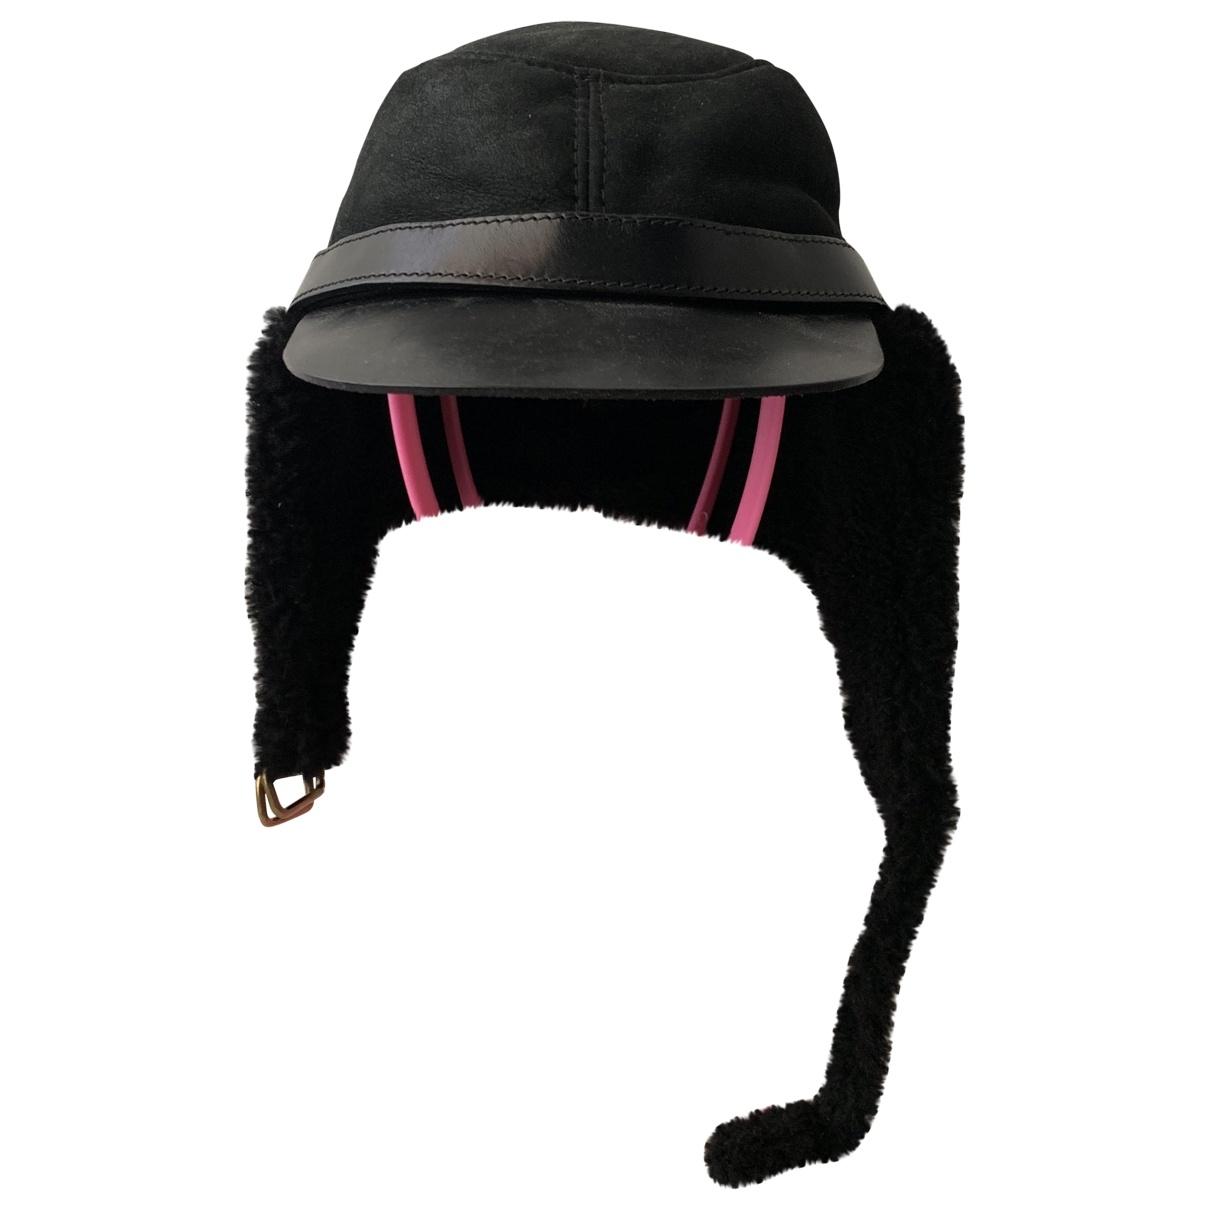 Burberry \N Black Leather hat & pull on hat for Men XL International